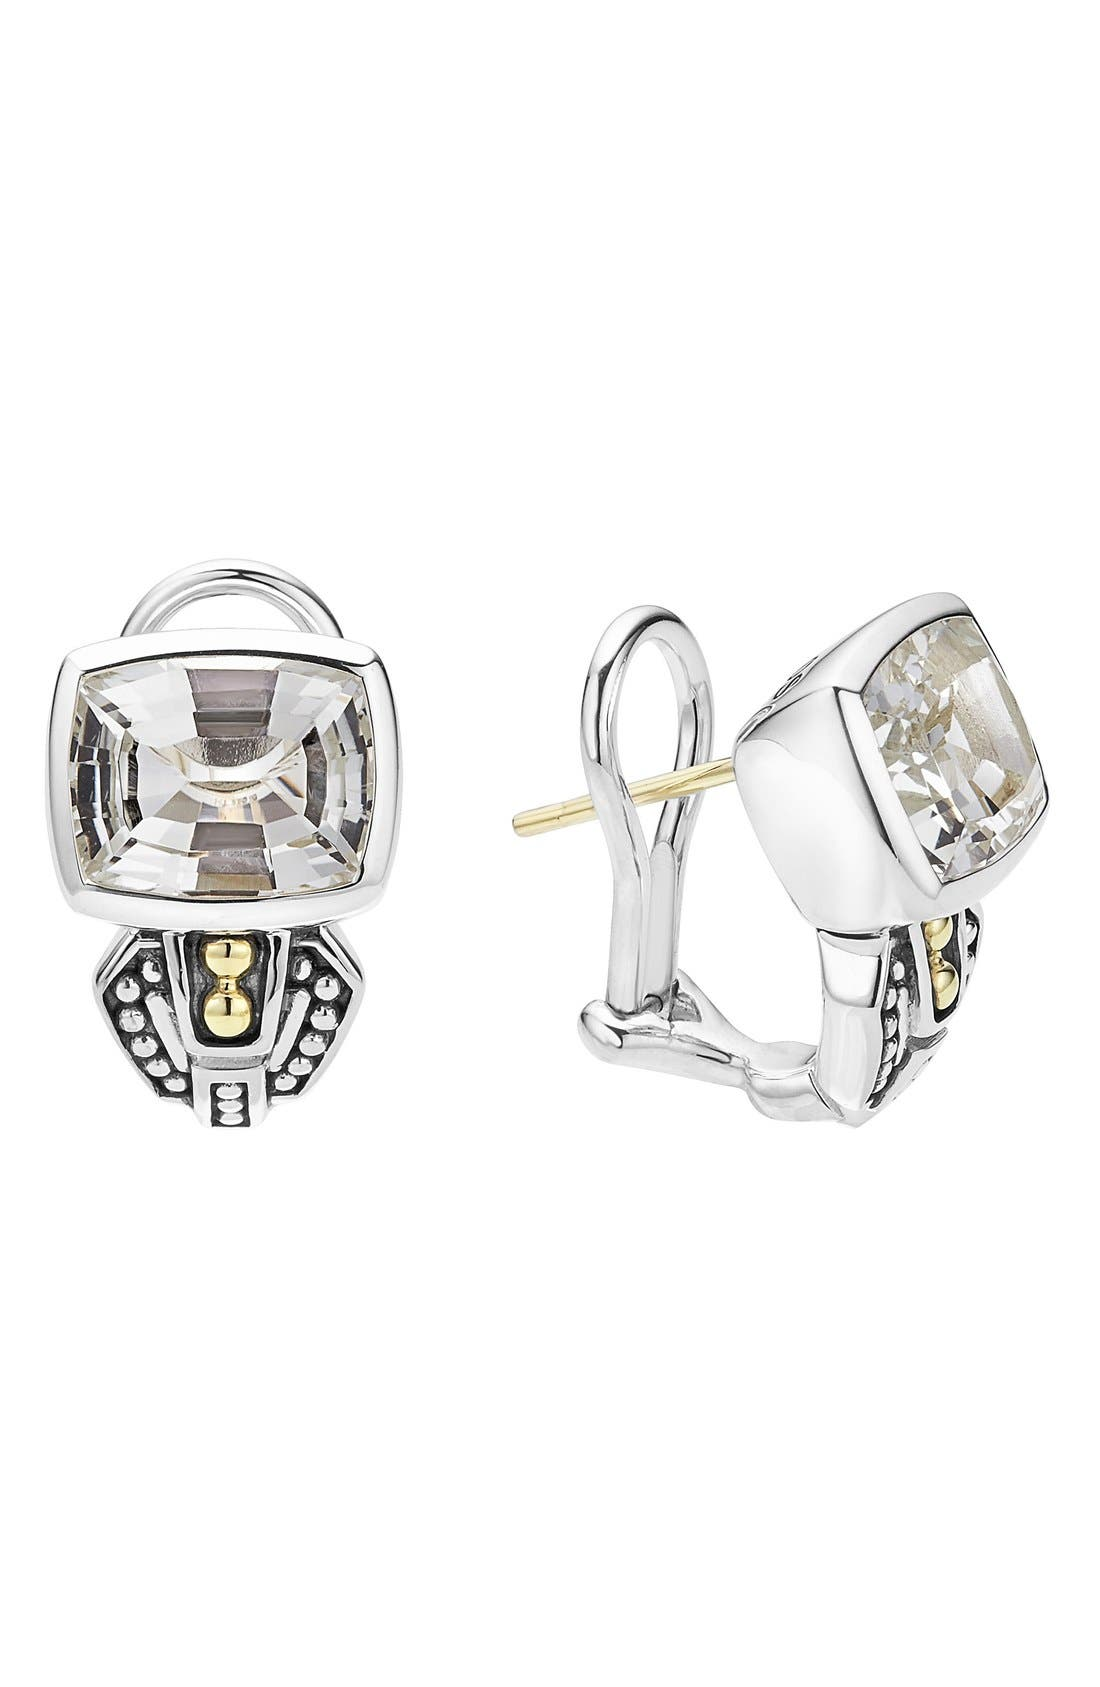 'Caviar Color' Semiprecious Stone Stud Earrings,                             Main thumbnail 1, color,                             White Topaz